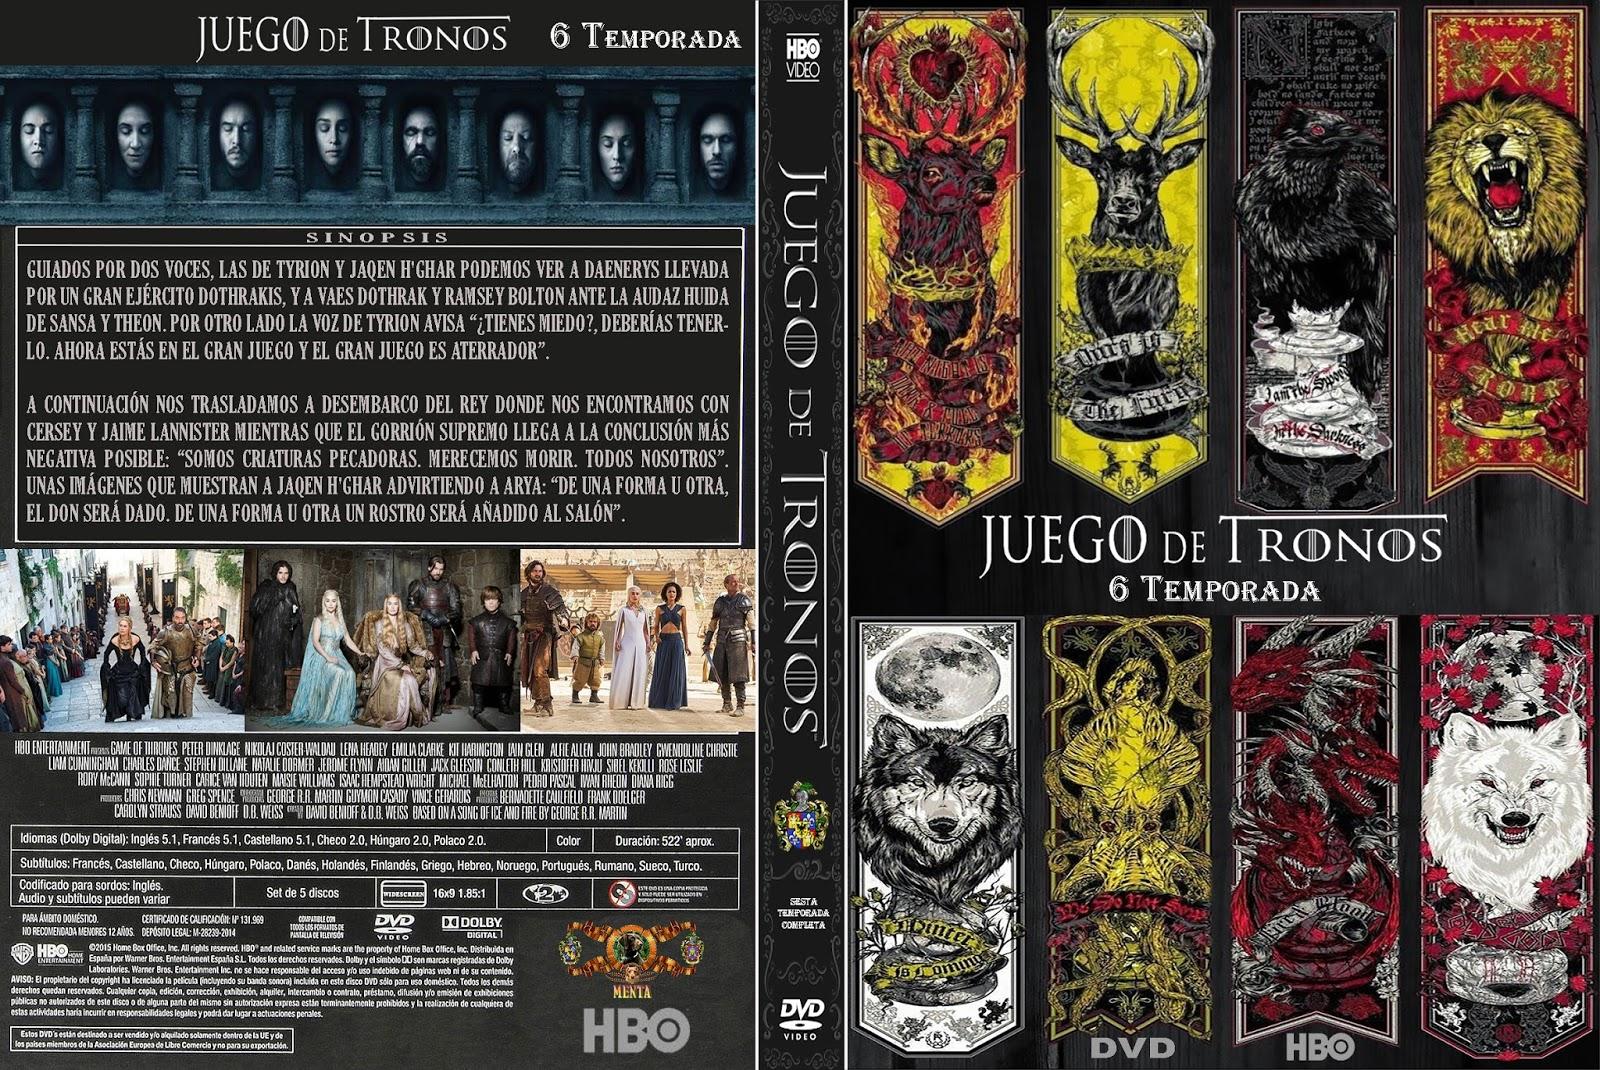 Juego de tronos temporada 2 online series pepito / New iphone 5s ...